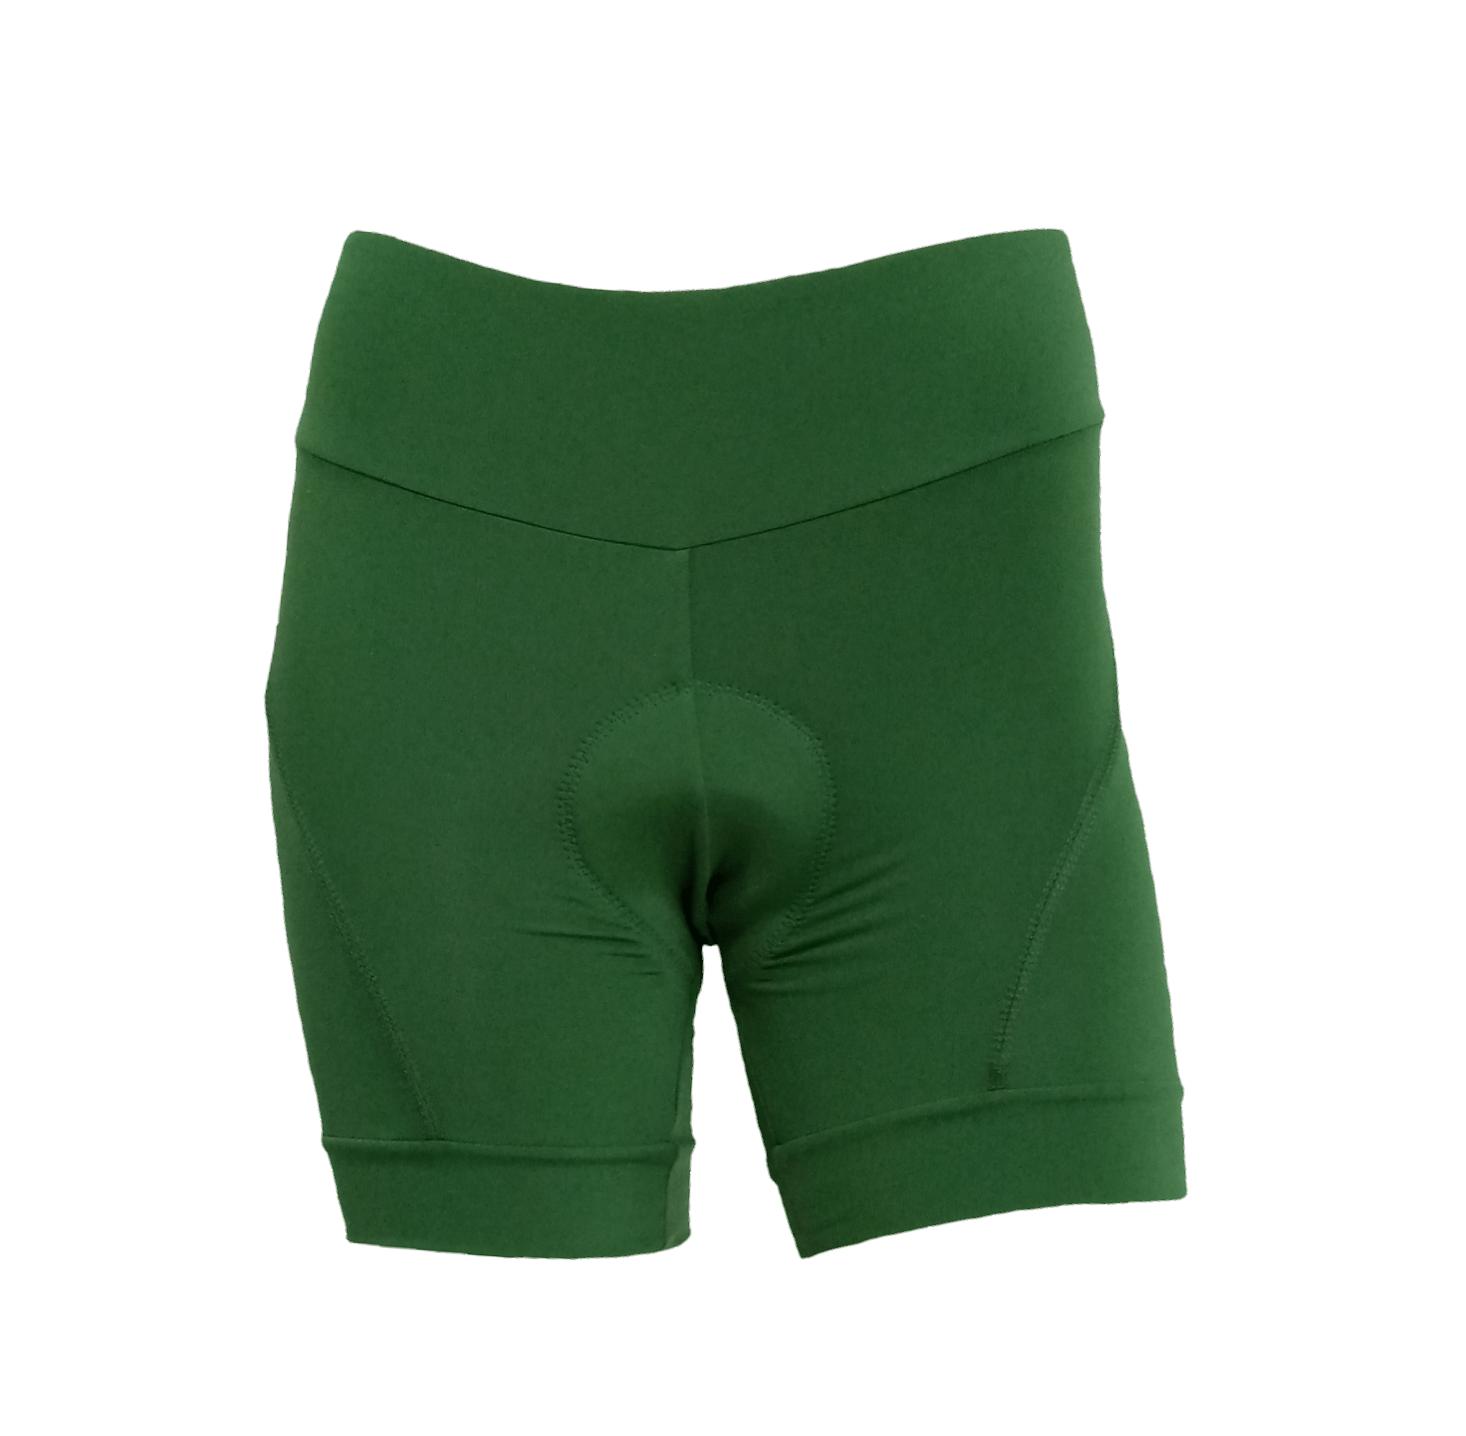 Bermuda Para Ciclismo Feminina Verde Musgo